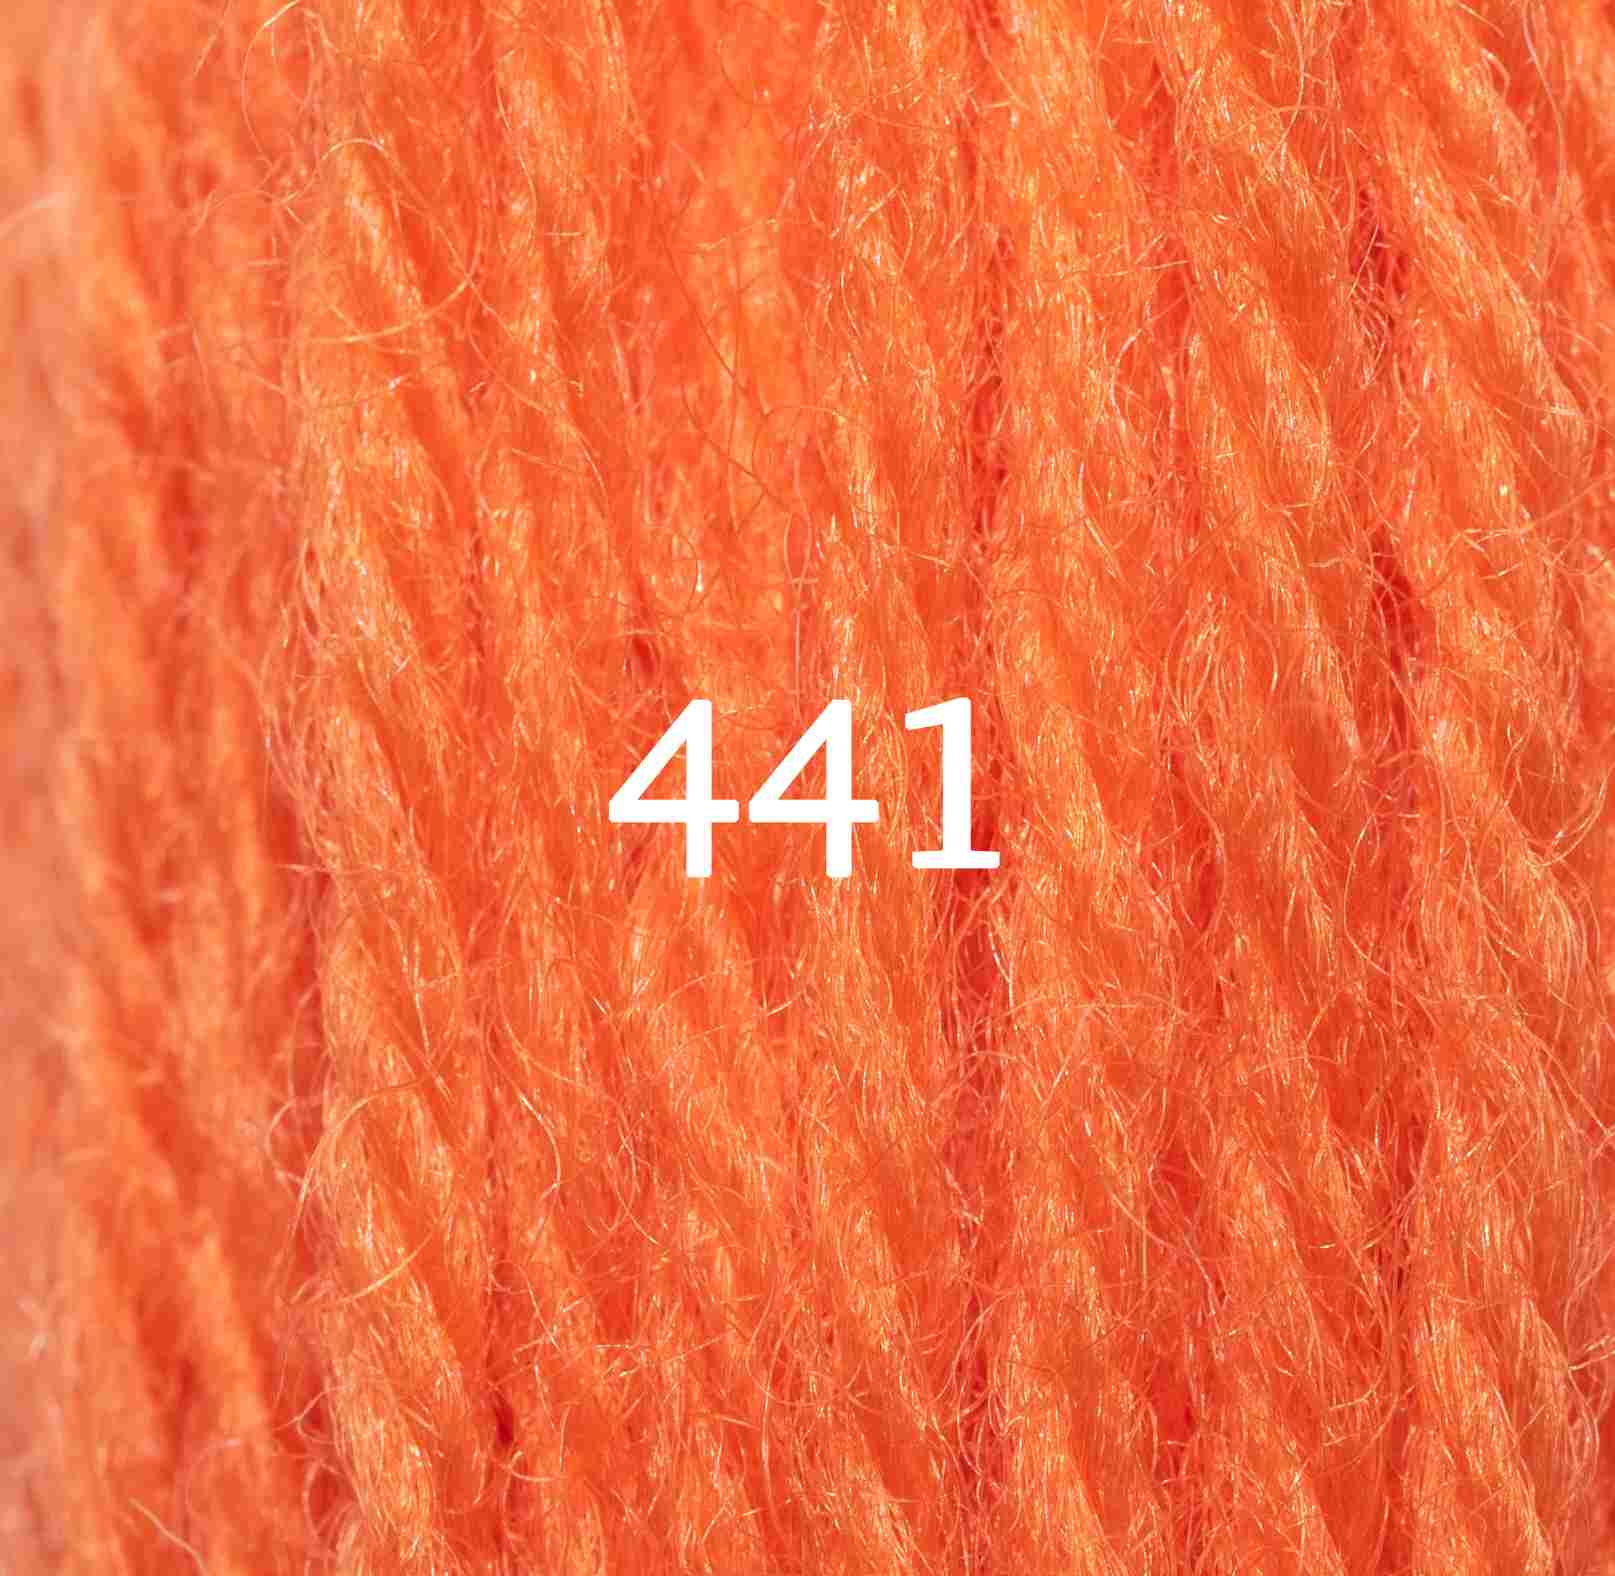 Orange-Red-441